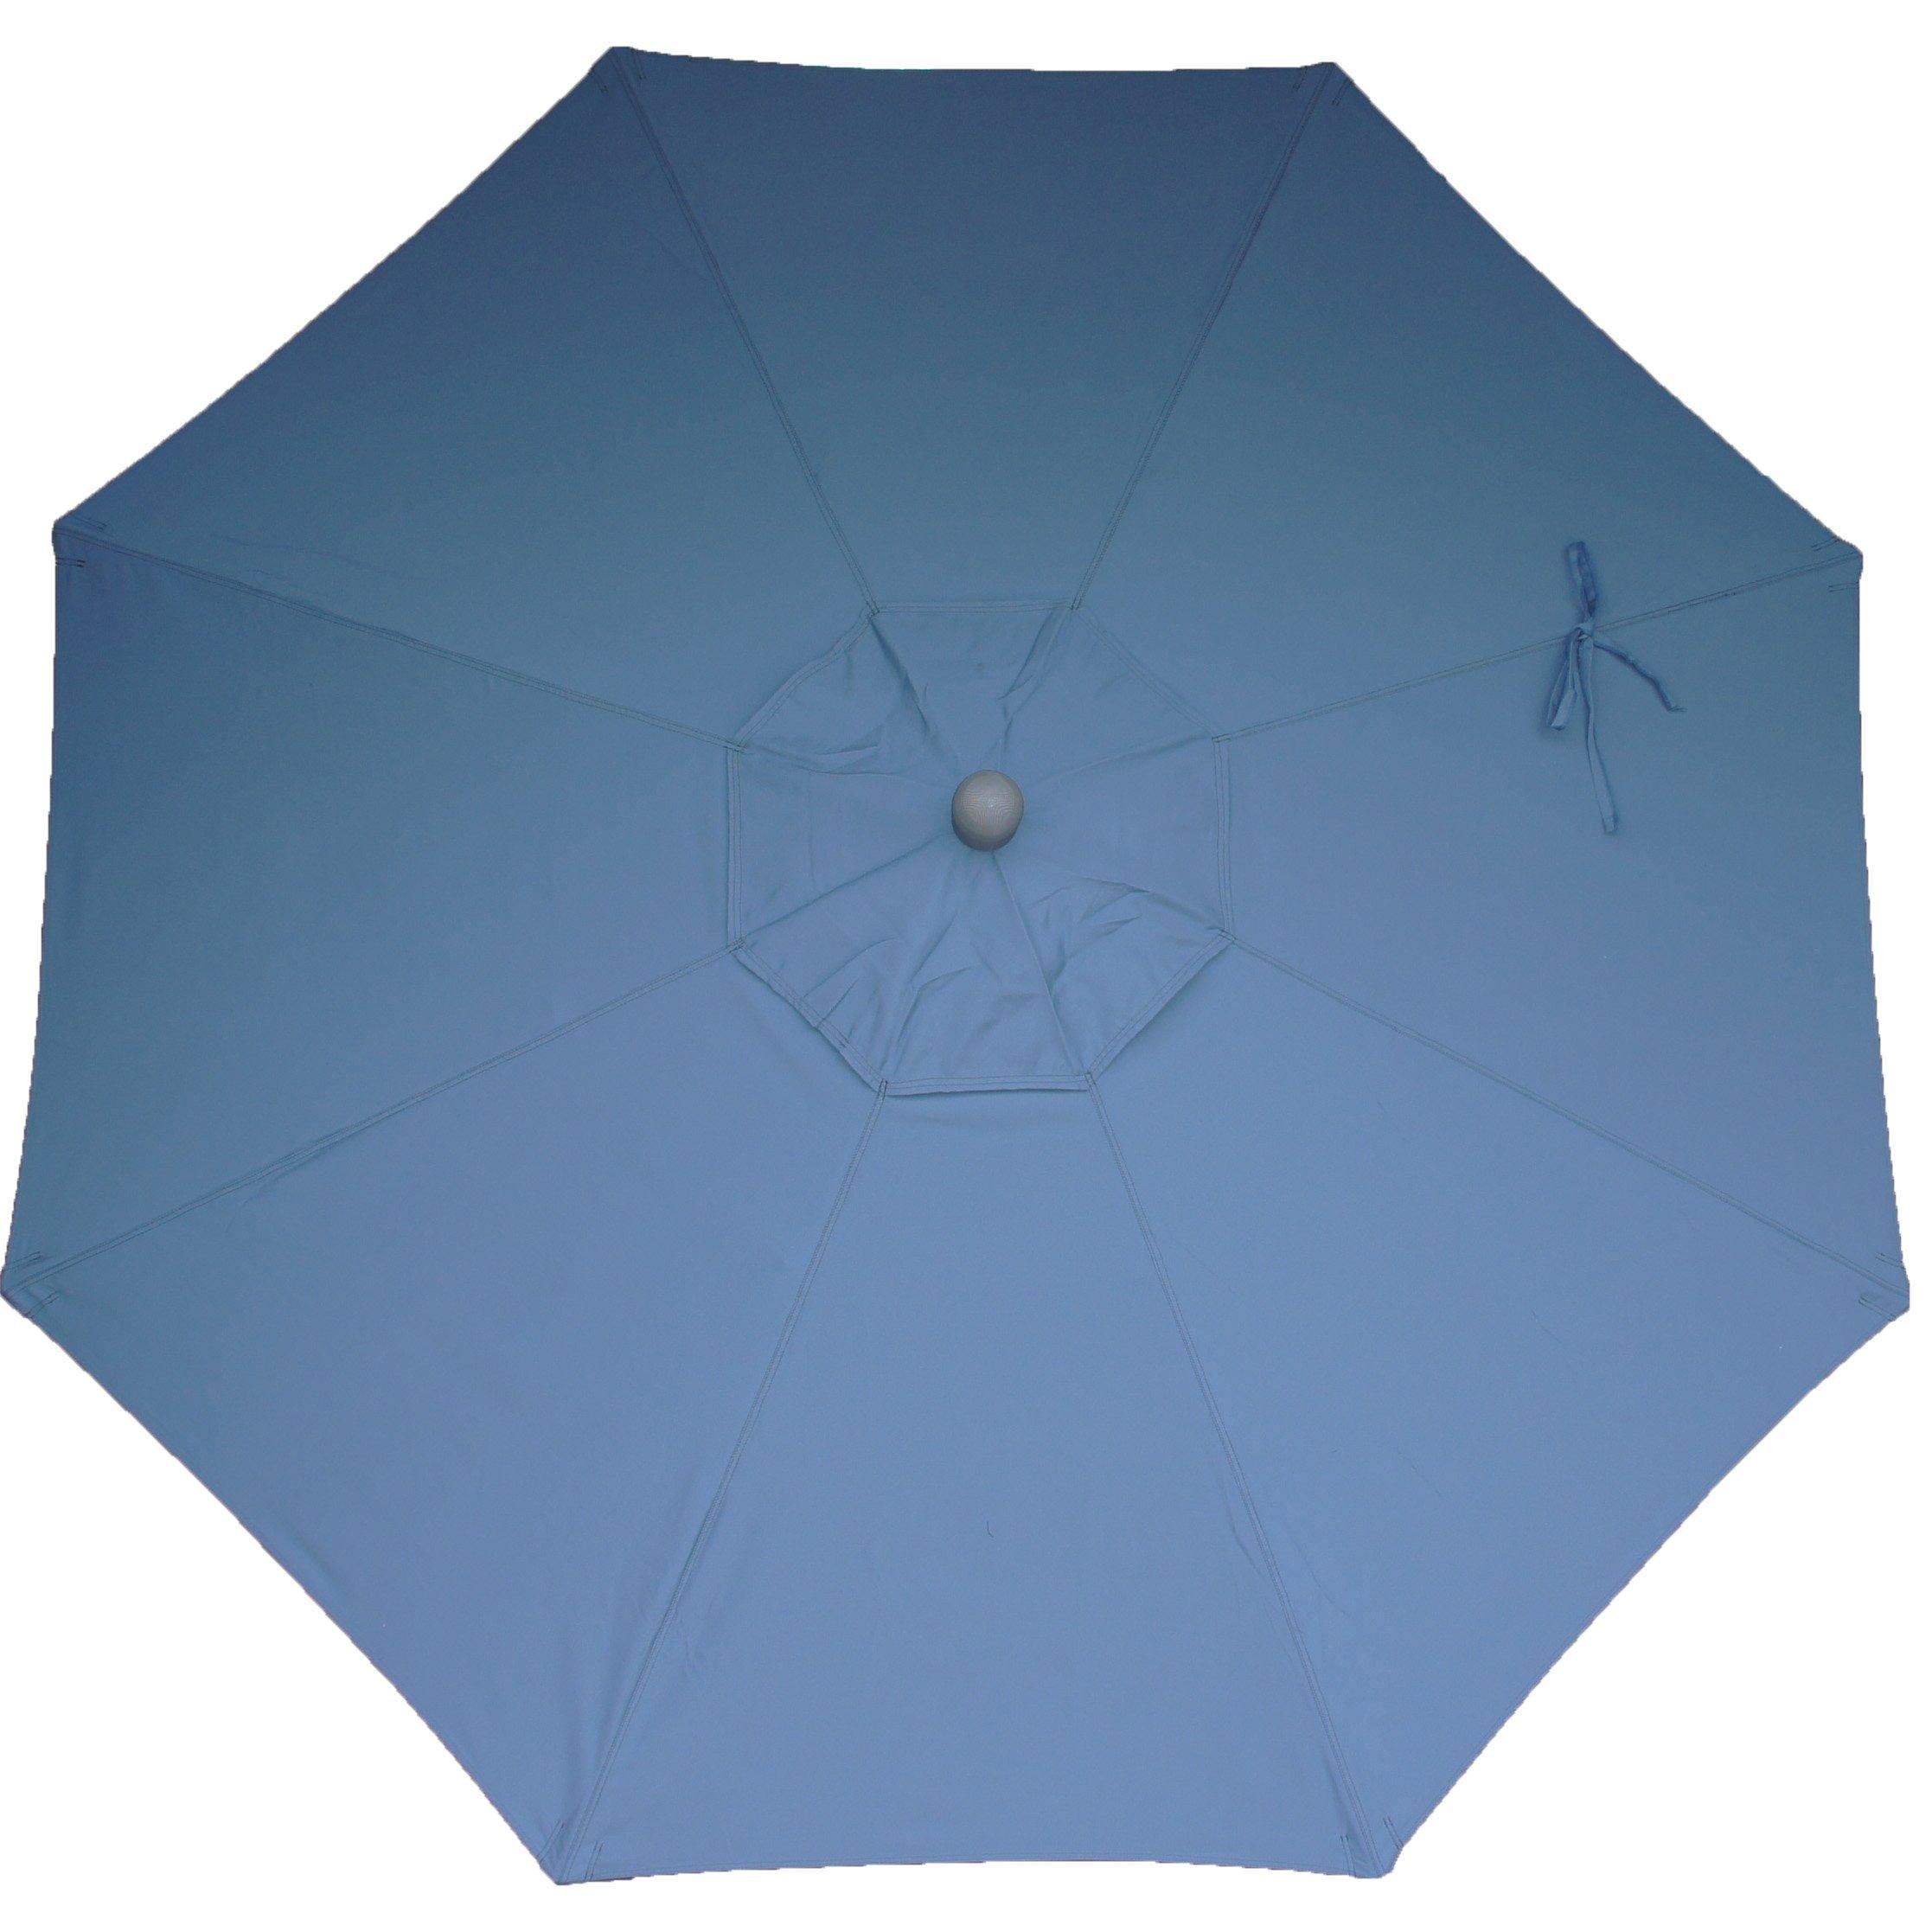 9ft 8 Ribs Market Umbrella Replacement Canopy (Sunbrella- Sapphire)